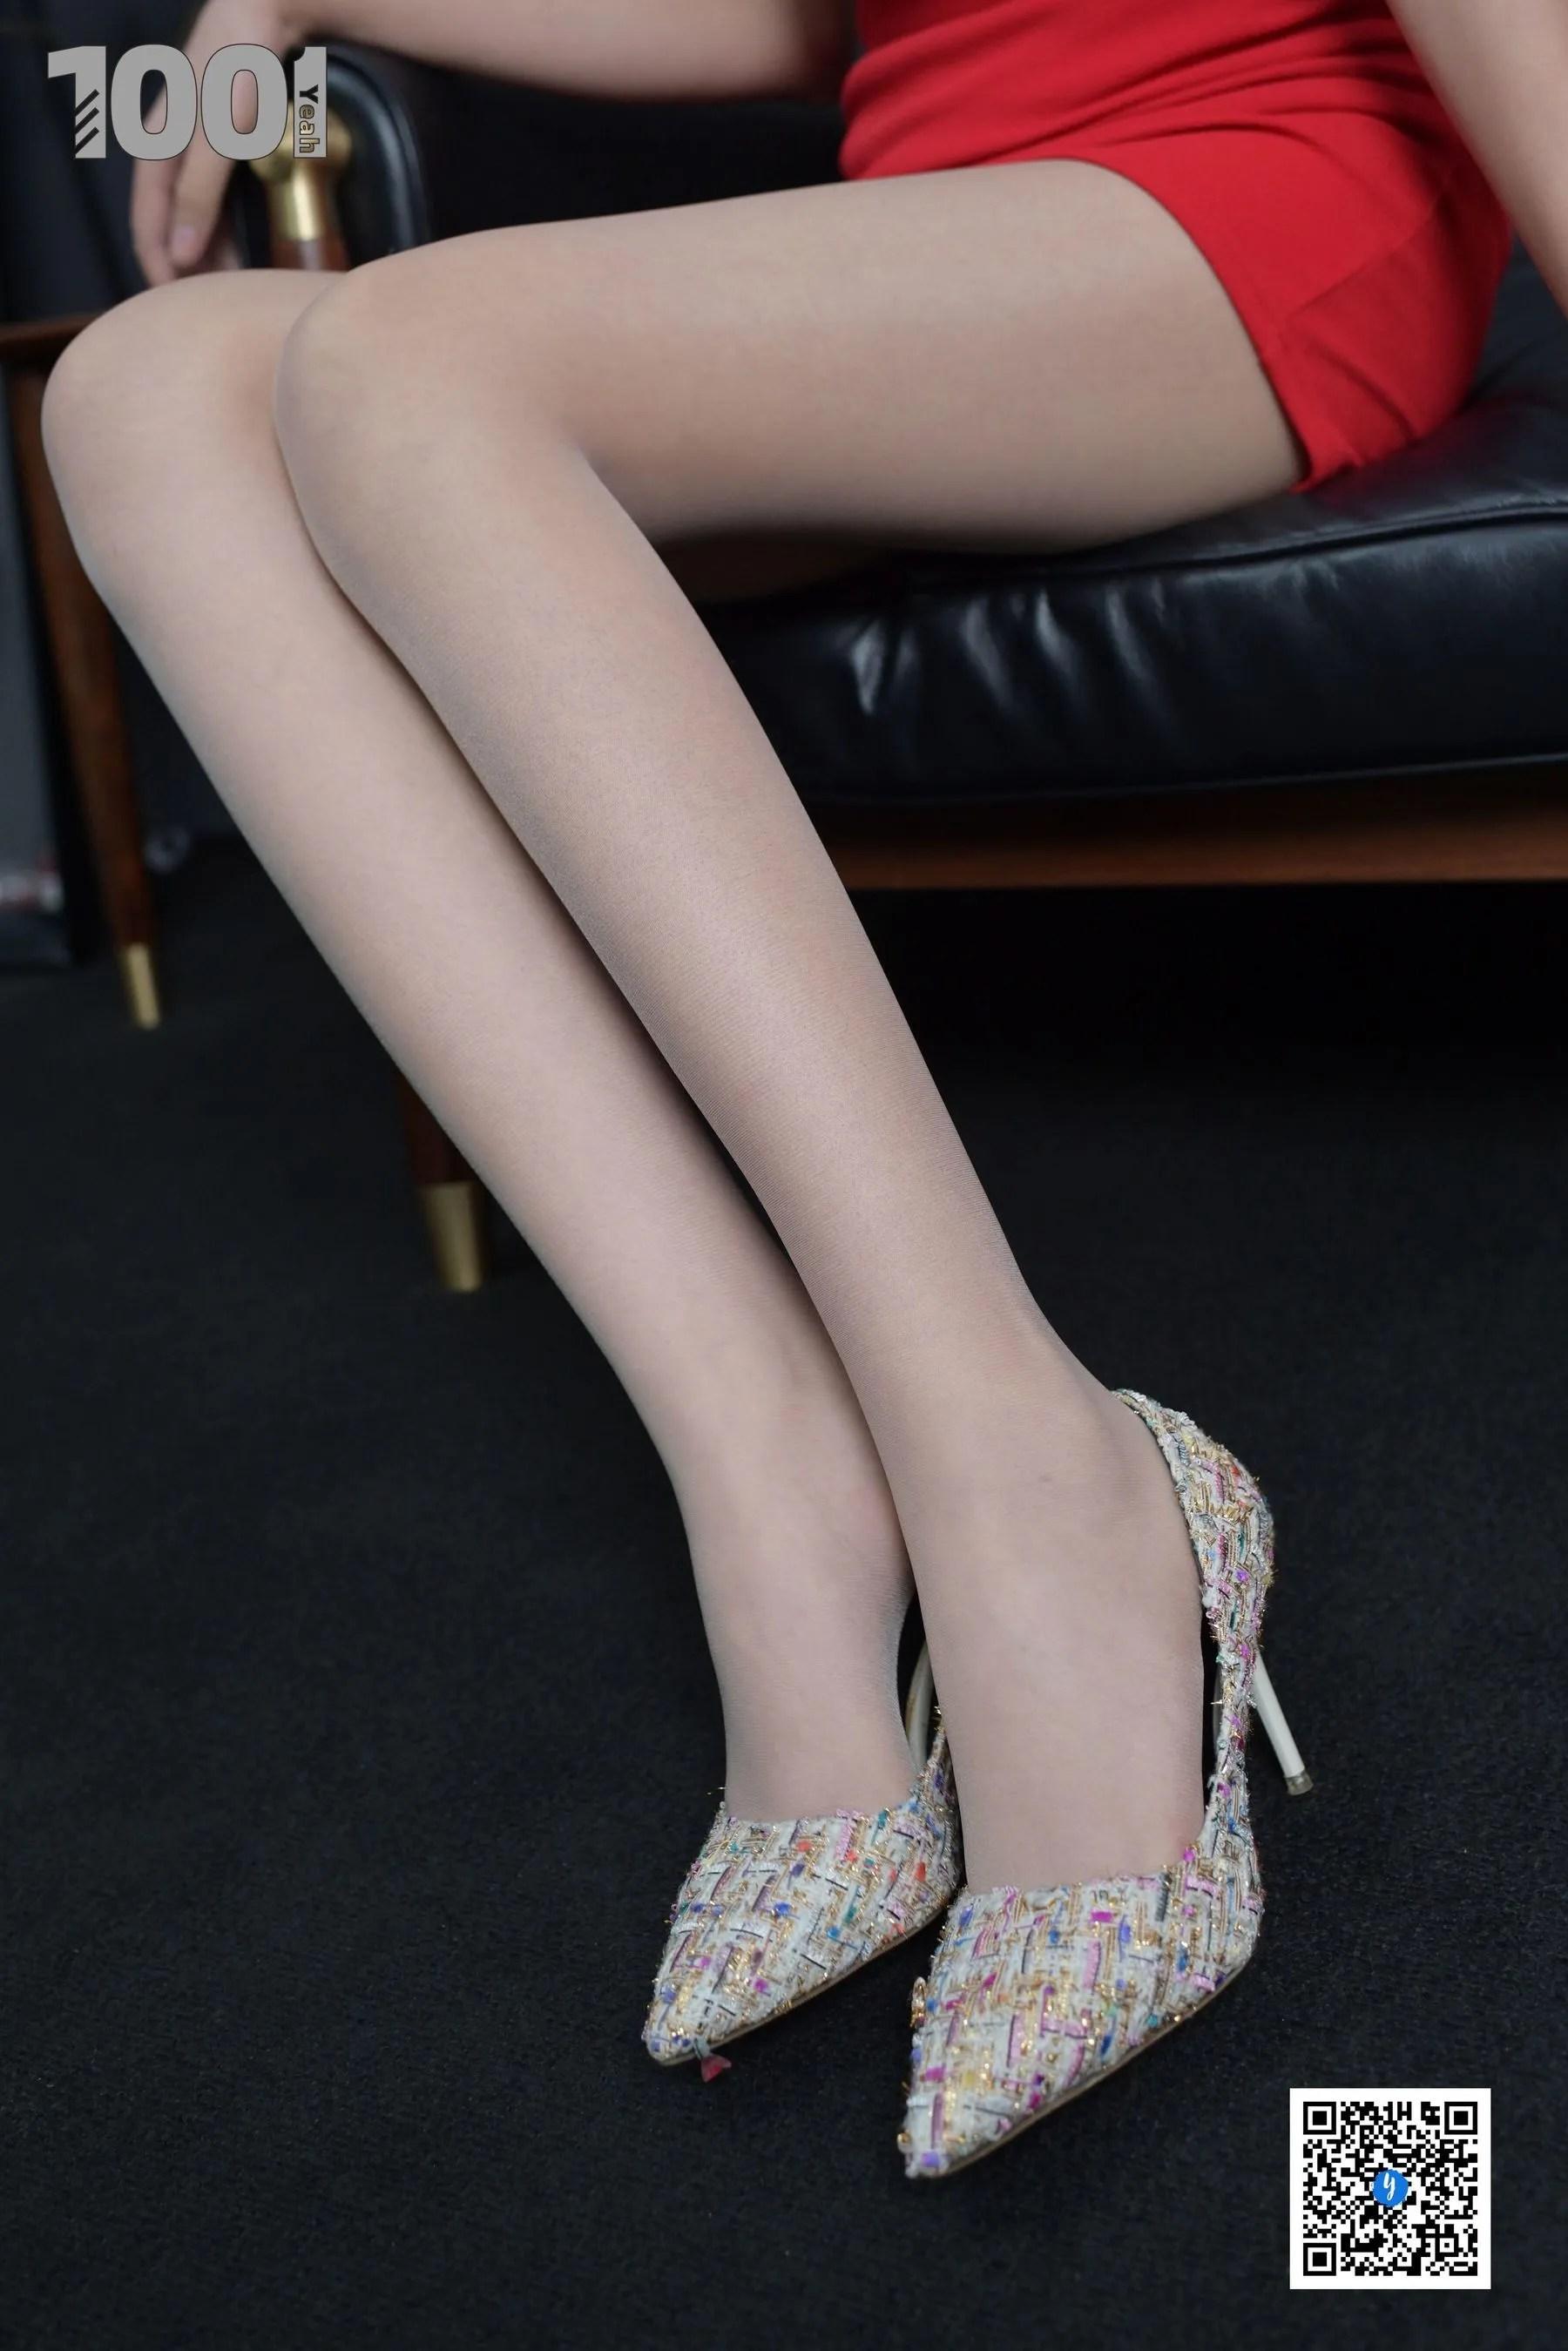 [IESS] NO.187 【一抹红】  丝袜美腿写真[87P]插图(8)